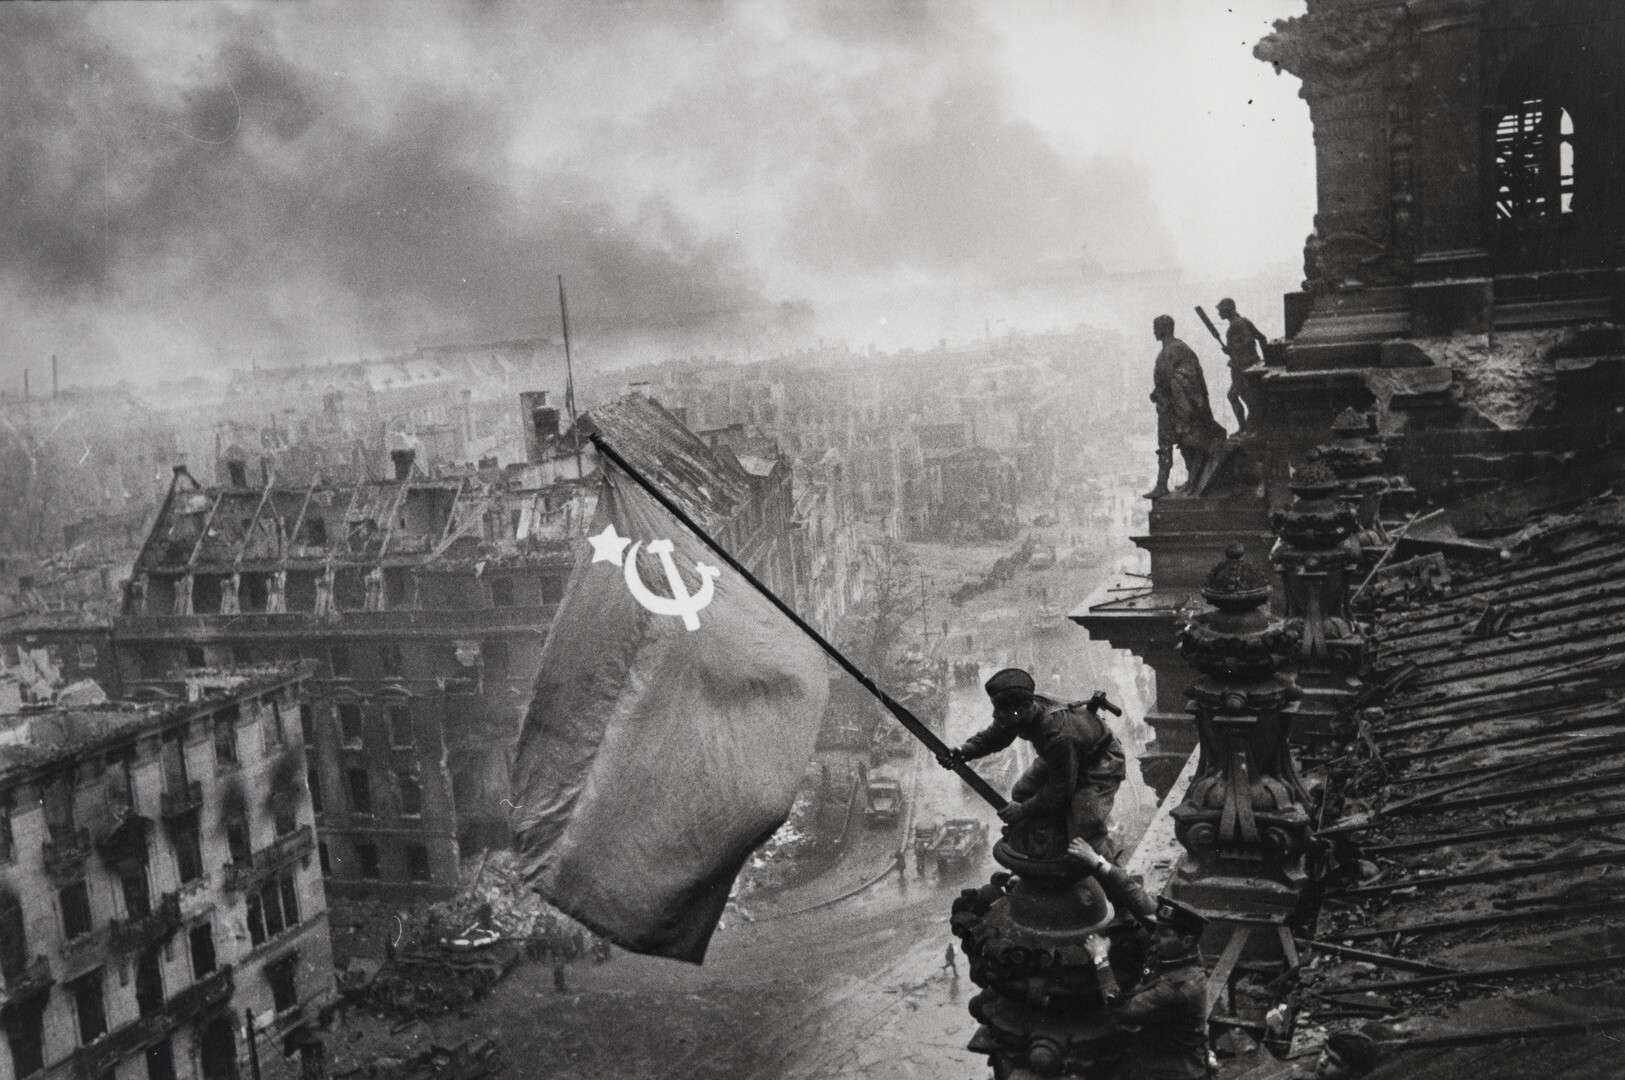 Евгений Халдей.    Флаг Победы   Германия,Берлин, 2 мая 1945